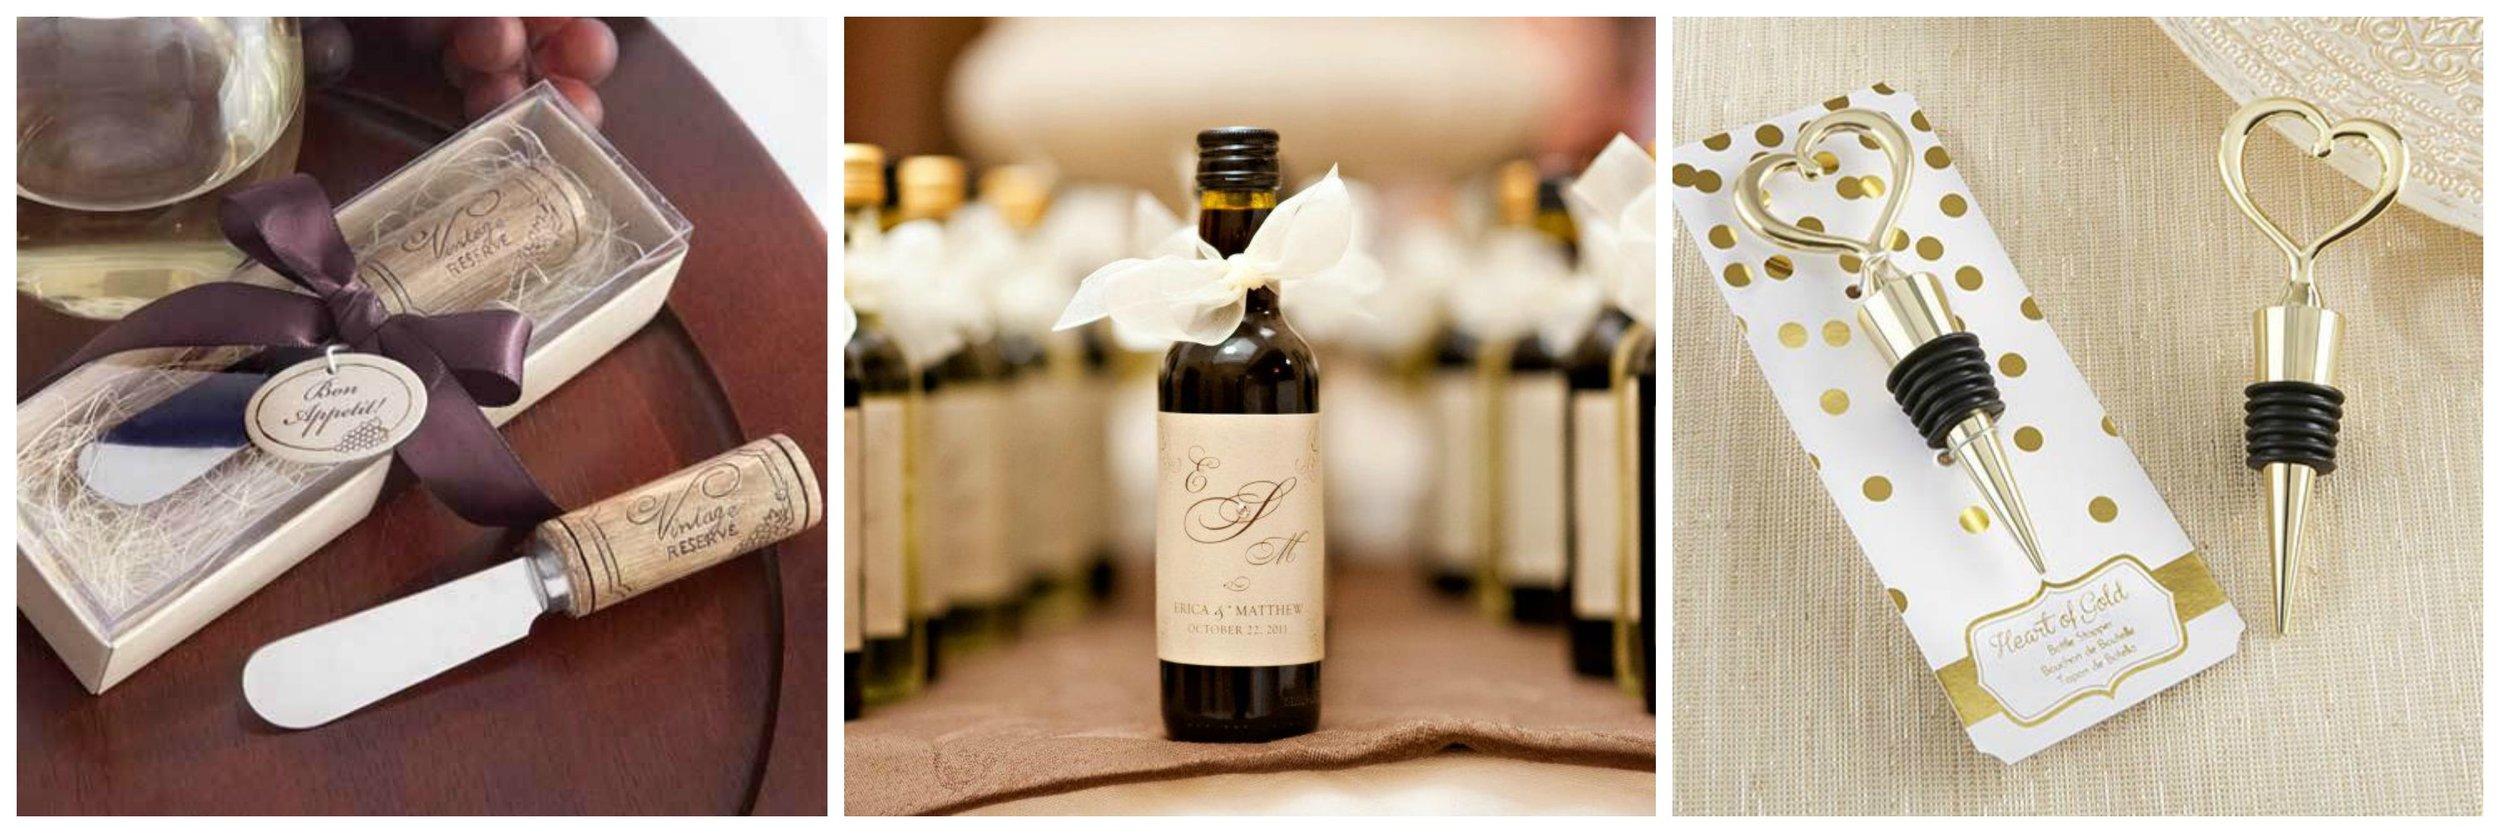 bomboniera tema vino langhe e roero barolo